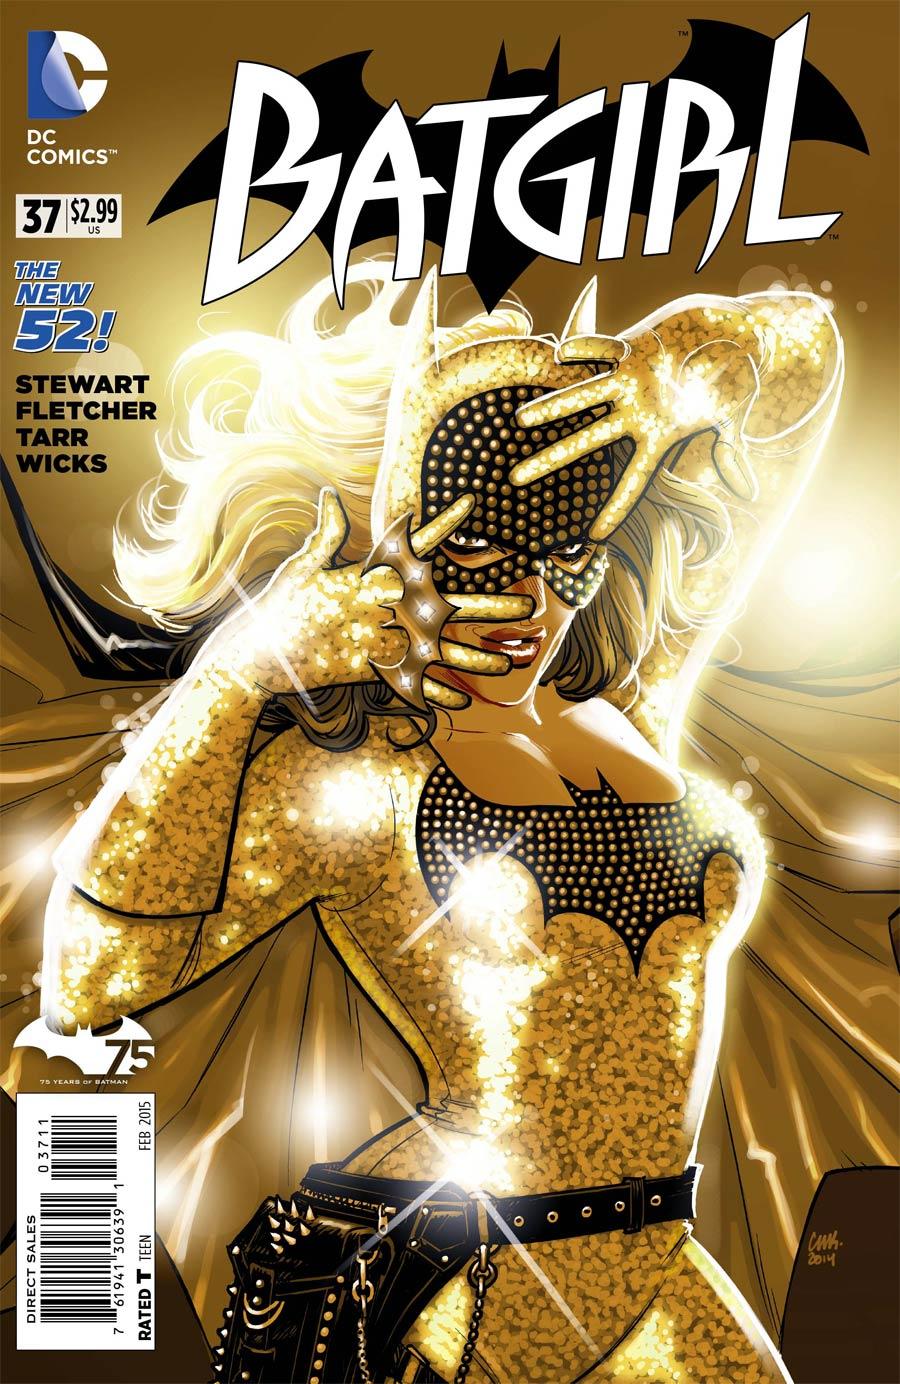 Batgirl Vol 4 #37 Cover A Regular Cameron Stewart Cover